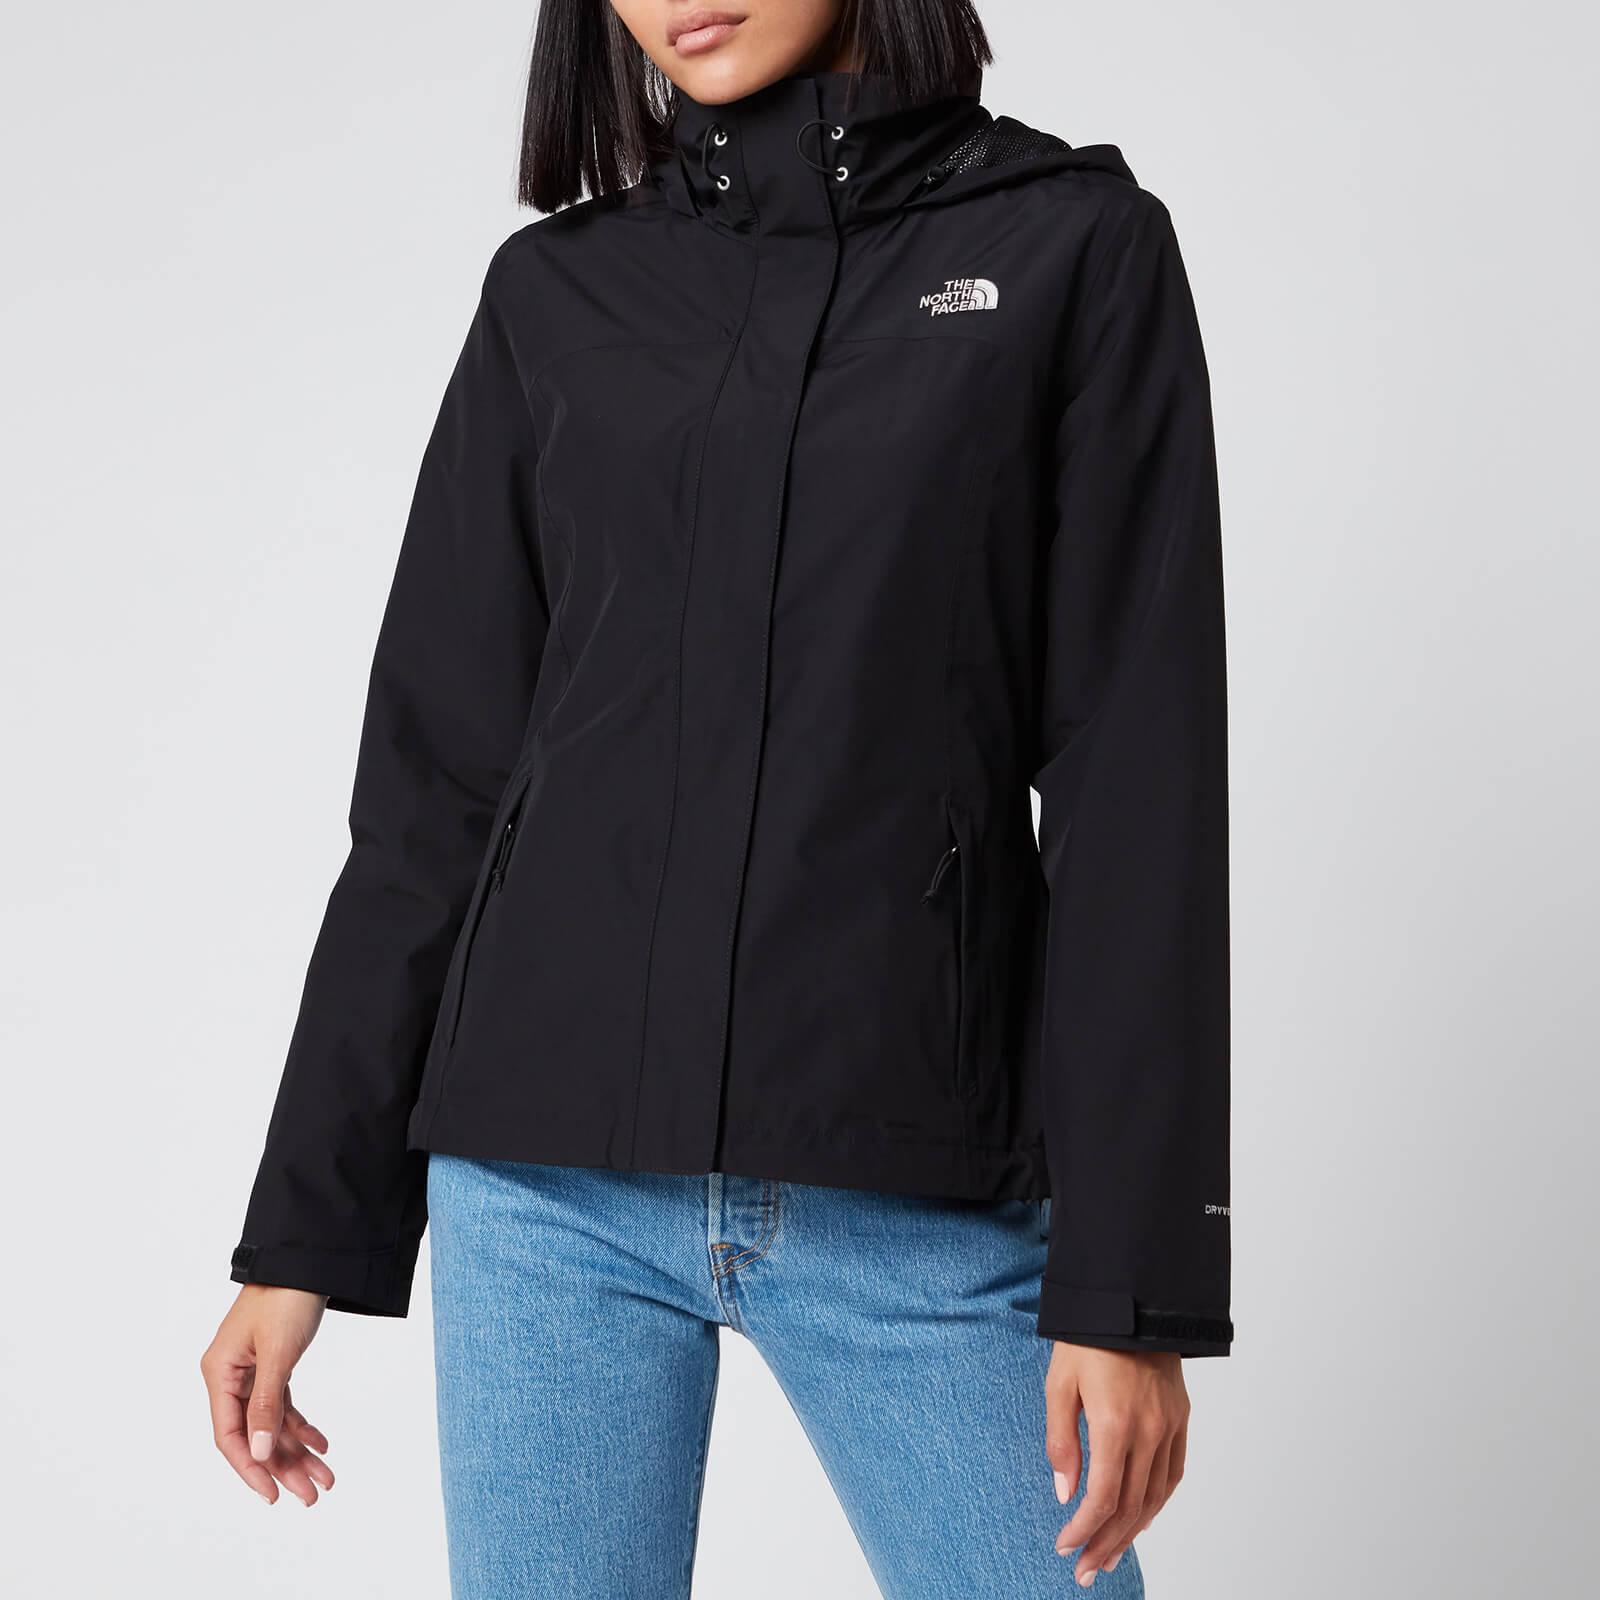 The North Face Women's Sangro Jacket - TNF Black